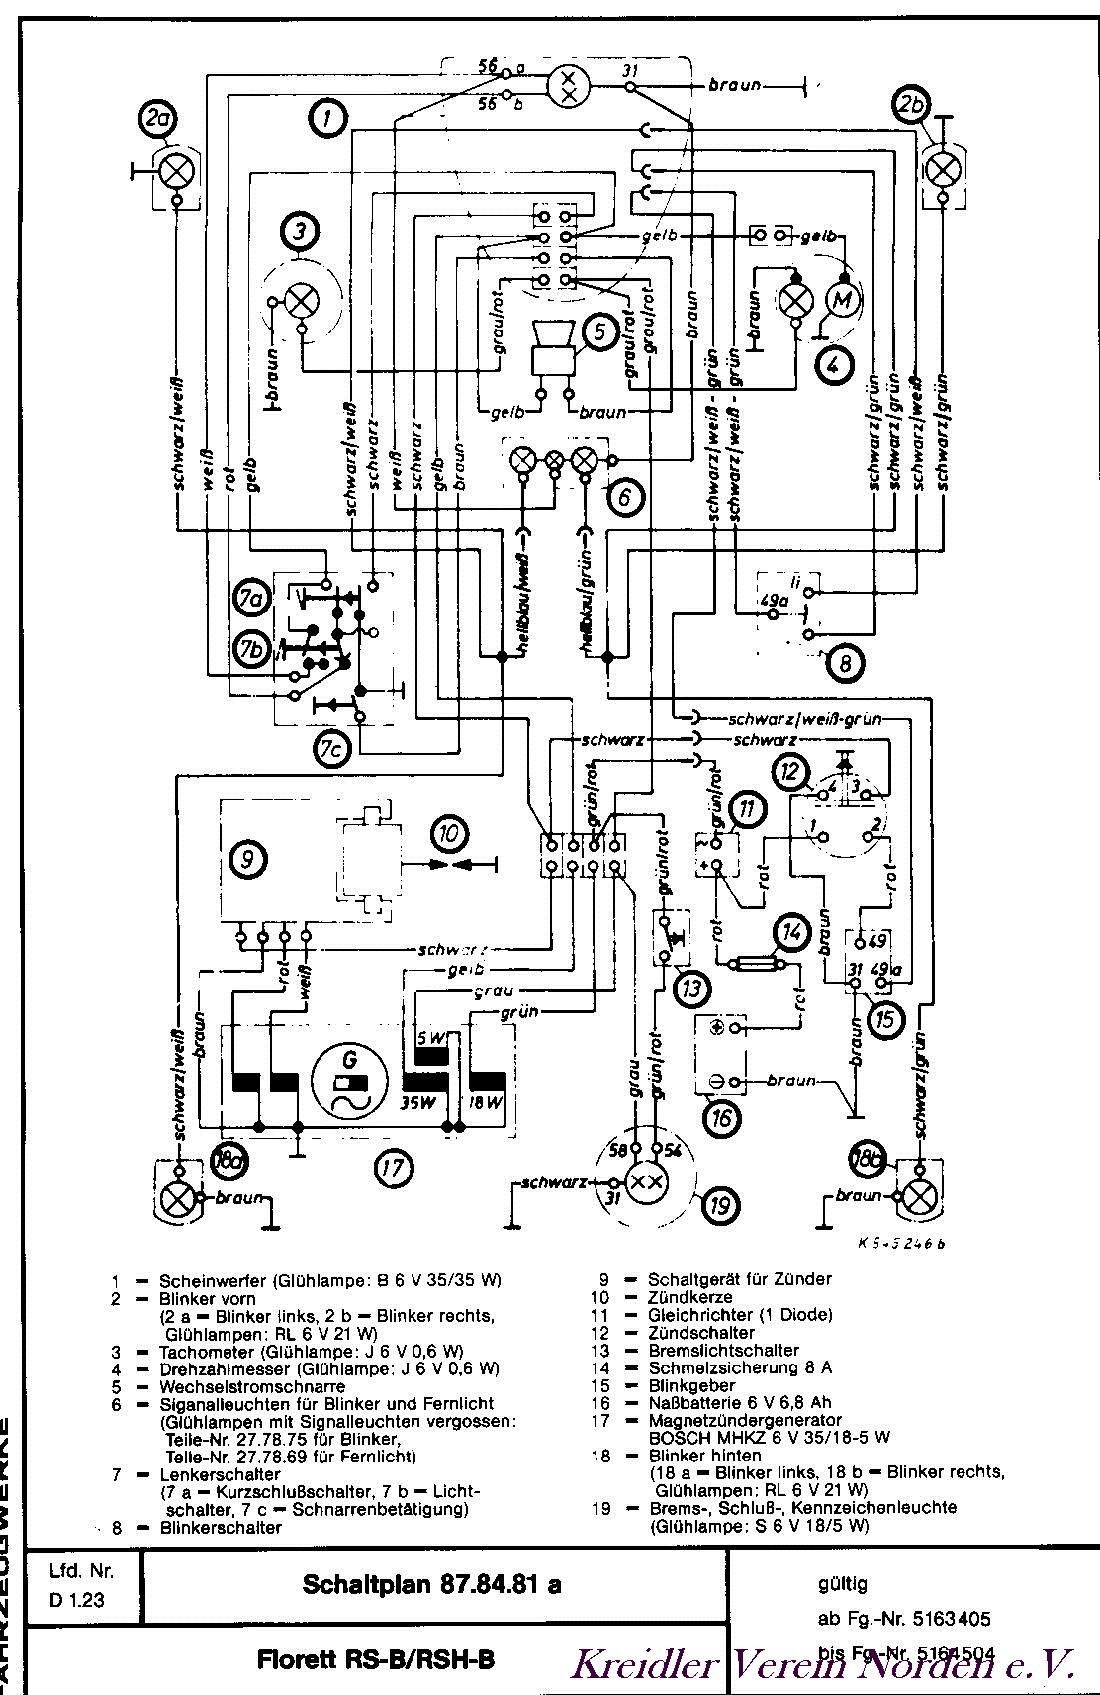 Schön 97 Ford Mustang Schaltplan Galerie - Schaltplan Serie Circuit ...